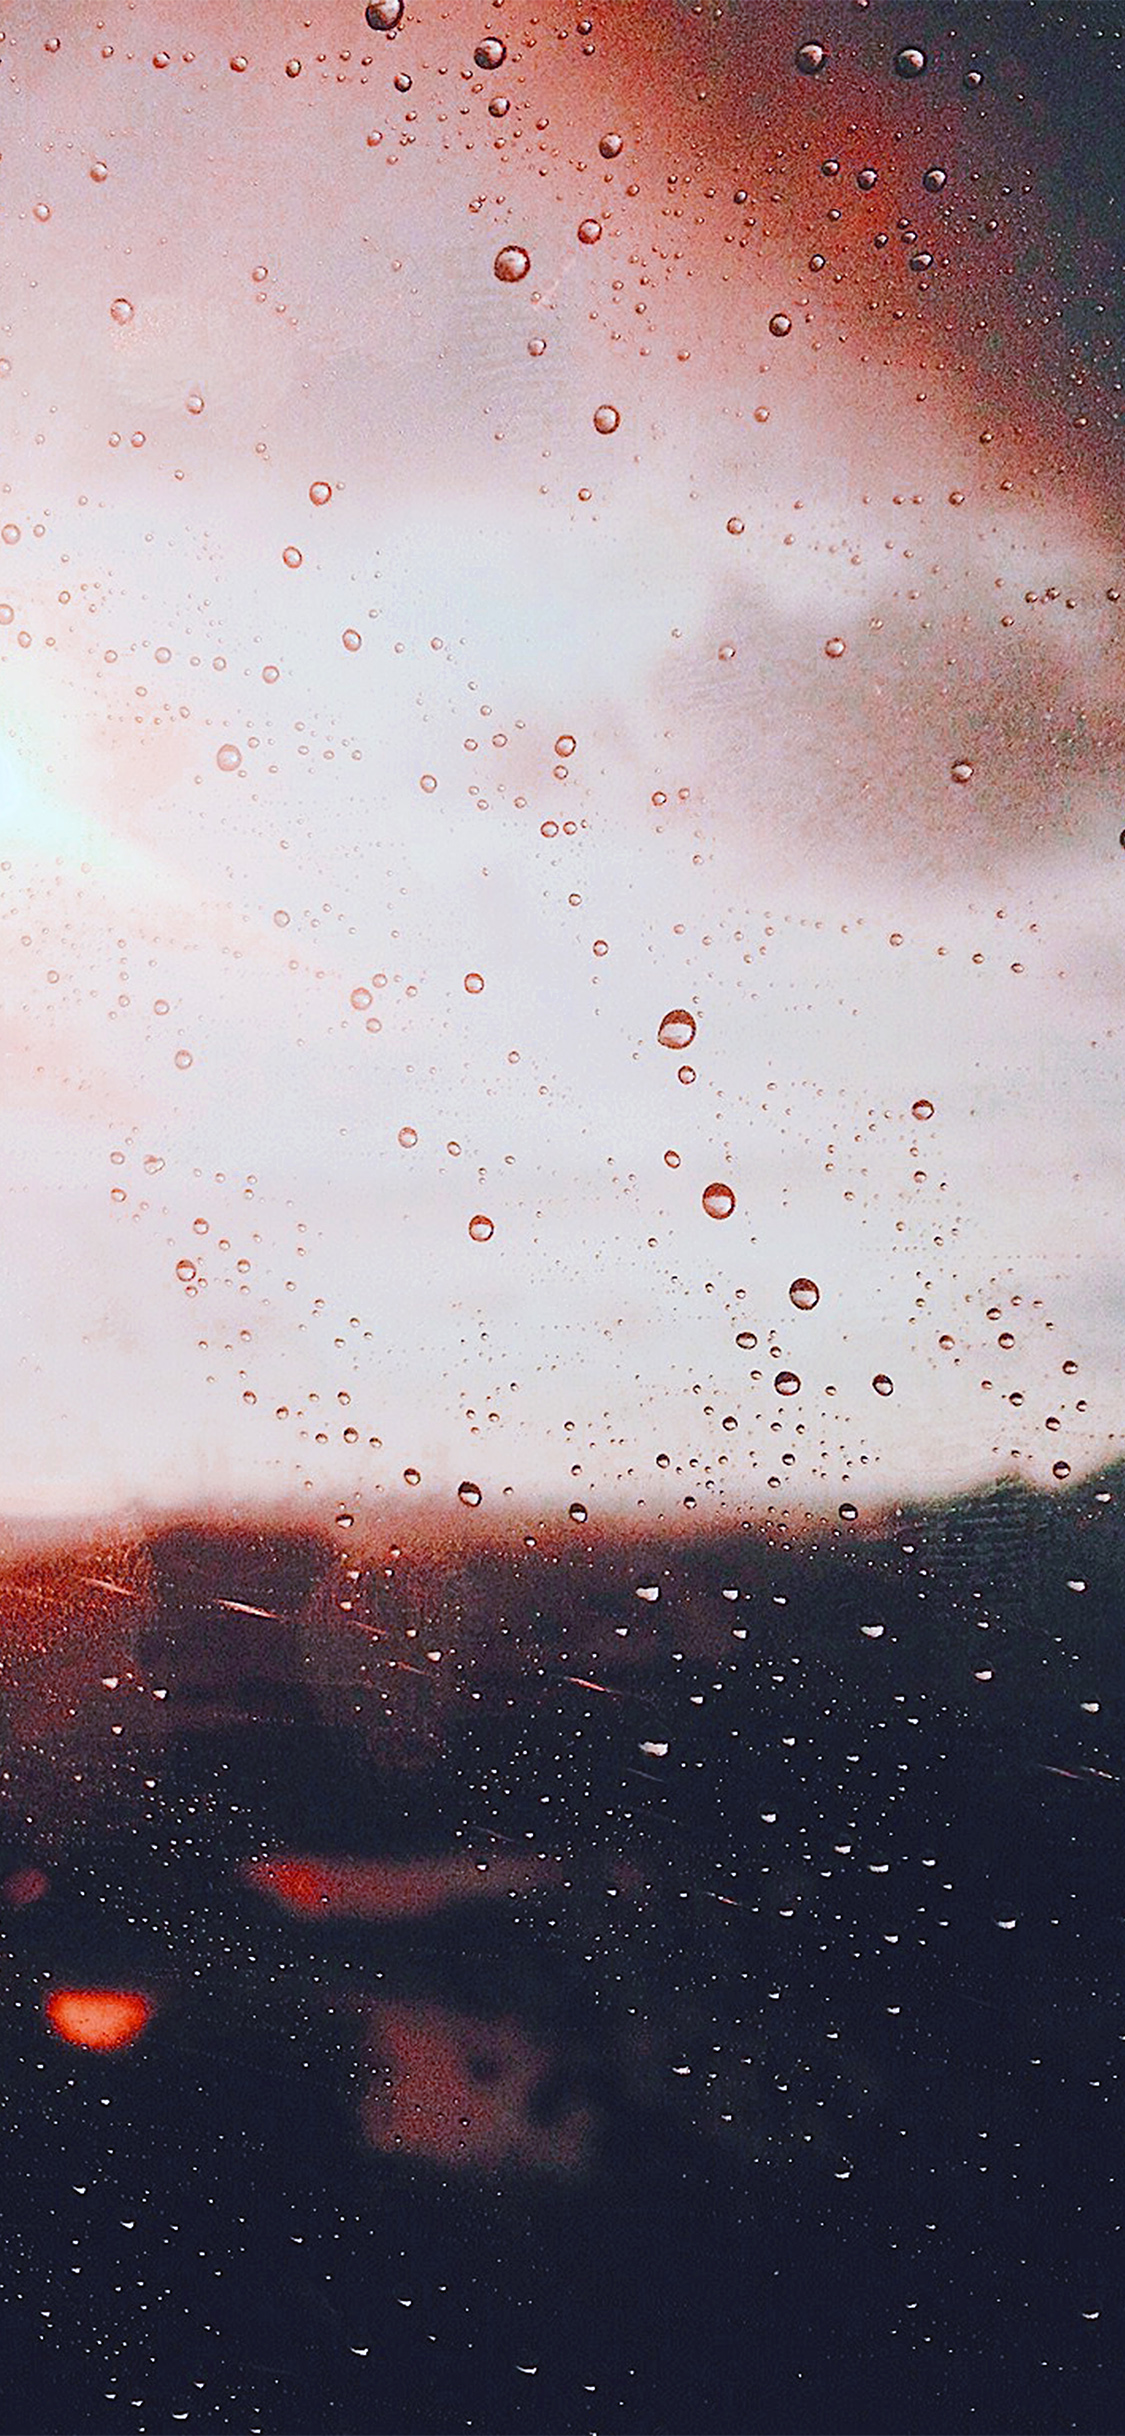 Papers Co Iphone Wallpaper Nj58 Rain Window Day Sunlight